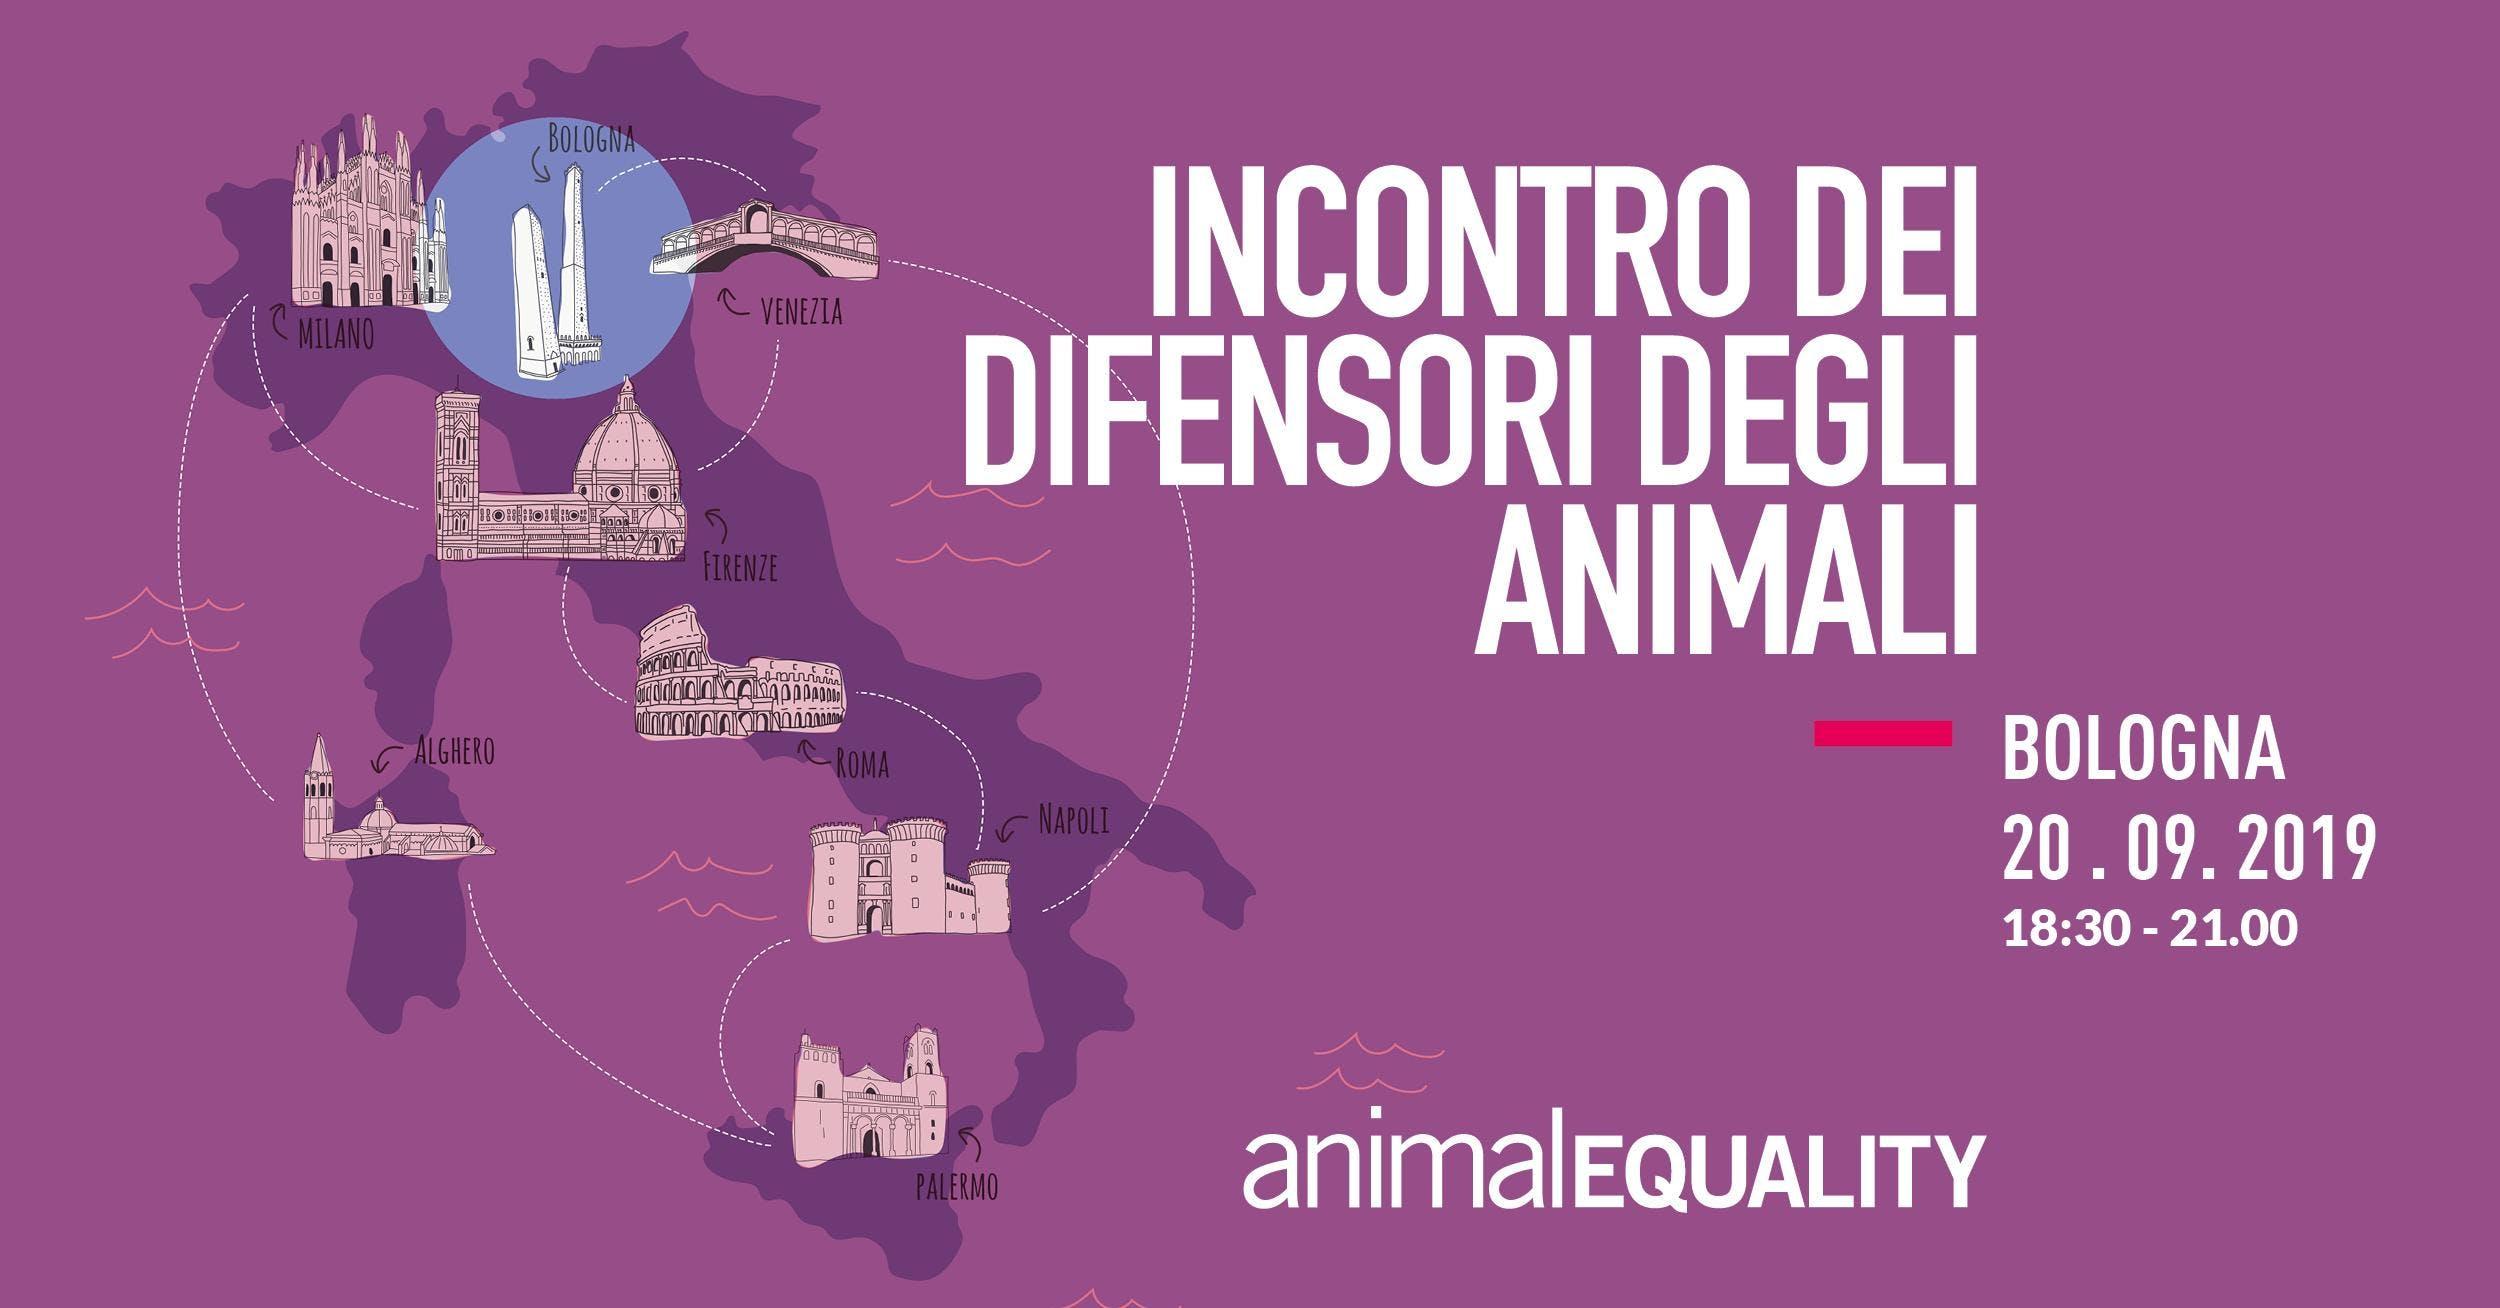 Incontro con Animal Equality Italia - Bologna